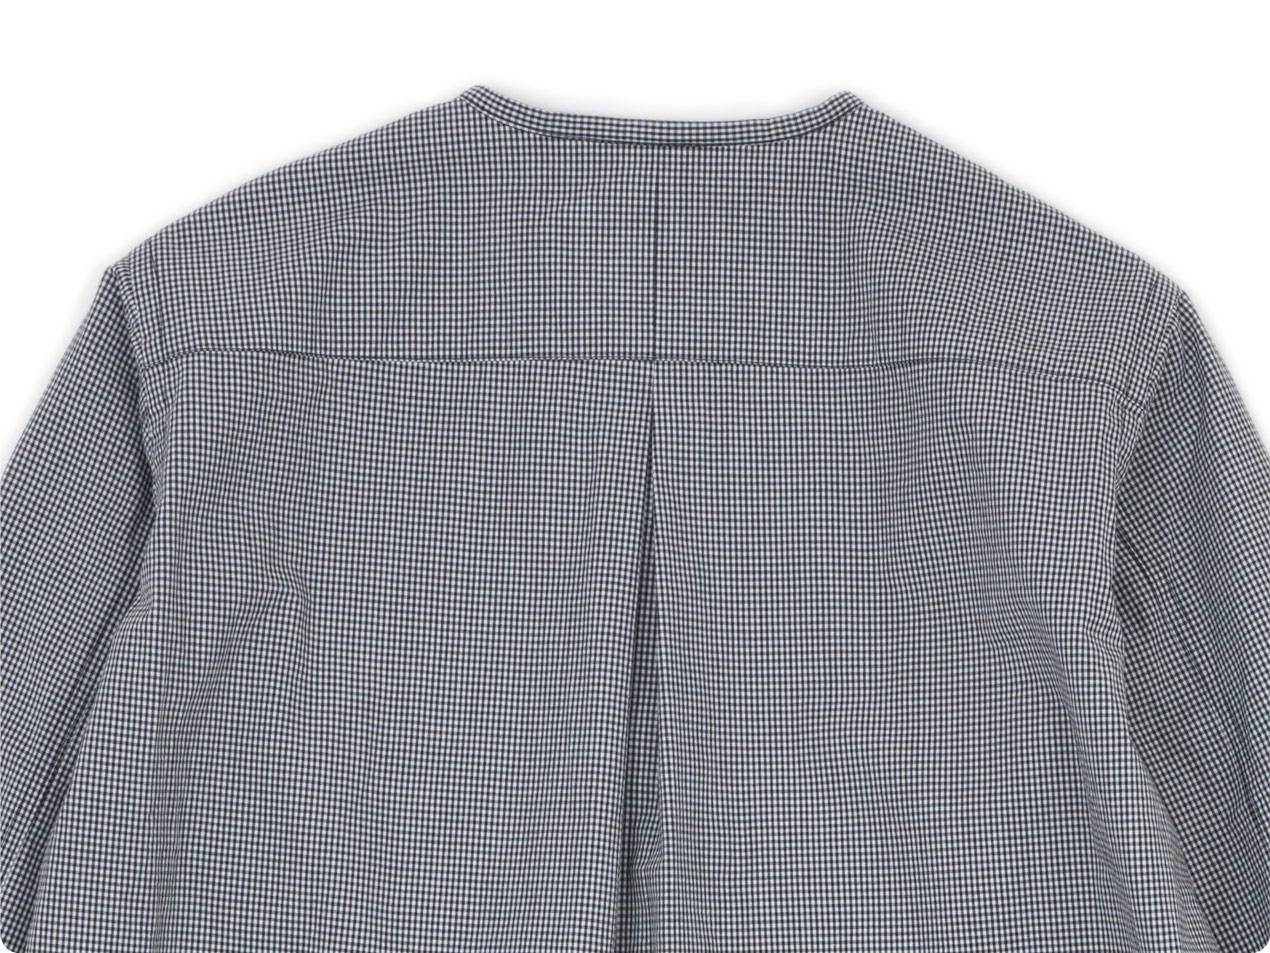 blanc no collar long shirts cotton MONOTONE GINGAM